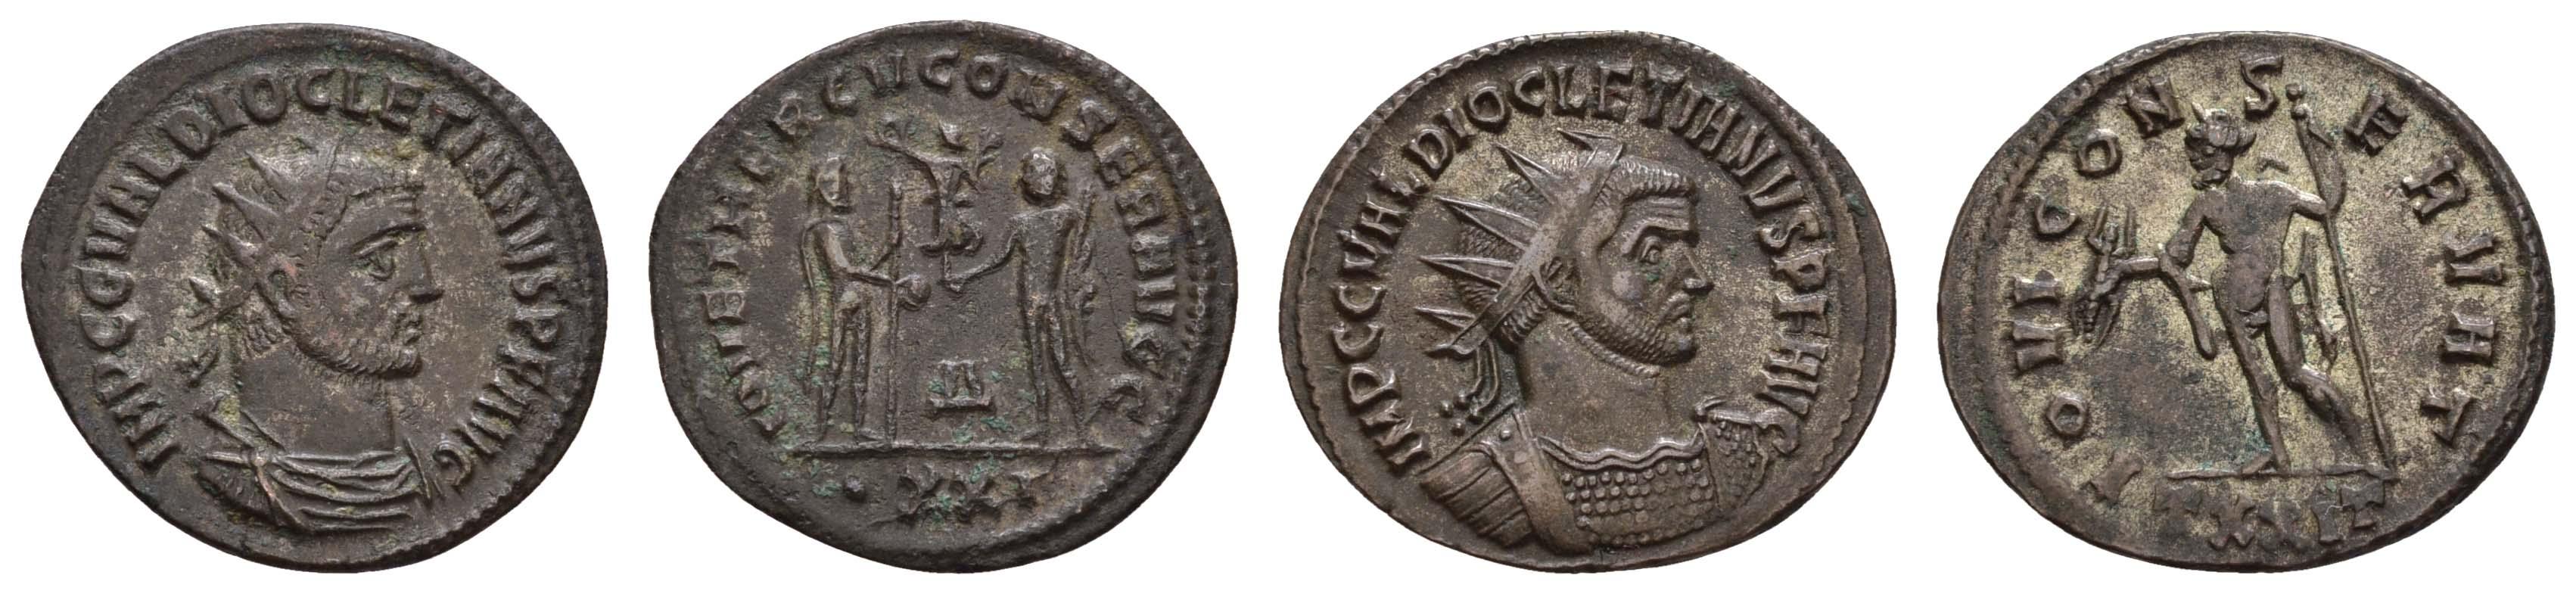 Lot 323 - Antike Römer - Kaiserzeit -  Auktionshaus Ulrich Felzmann GmbH & Co. KG Coins single lots